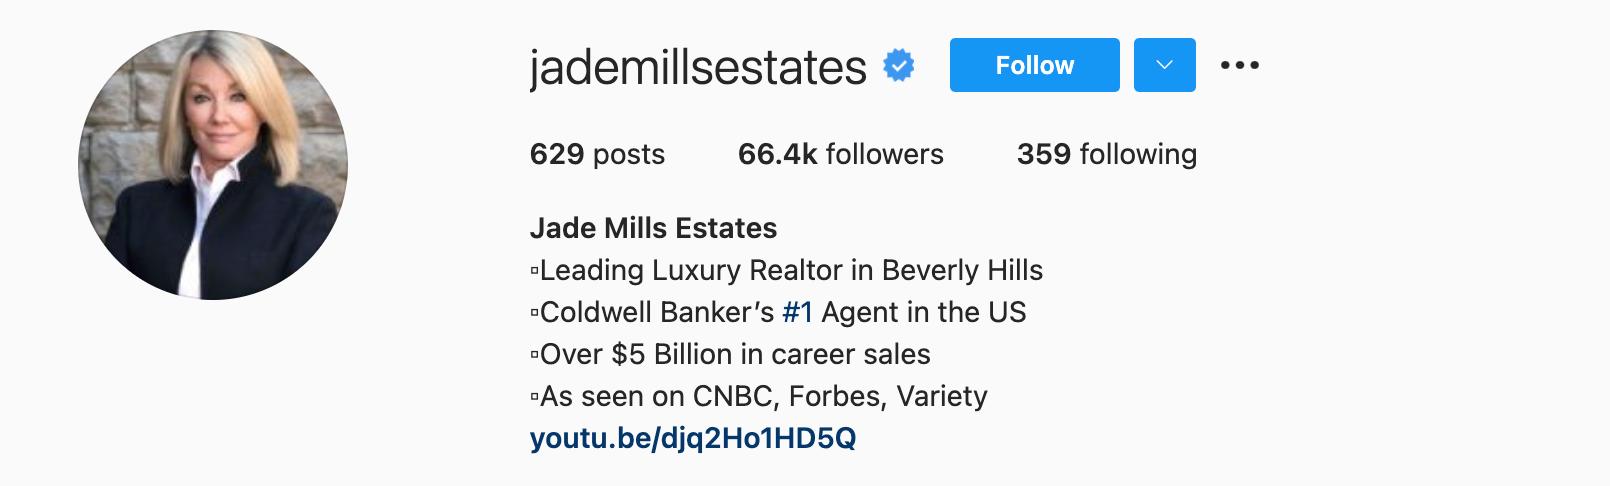 real estate social media bio examples